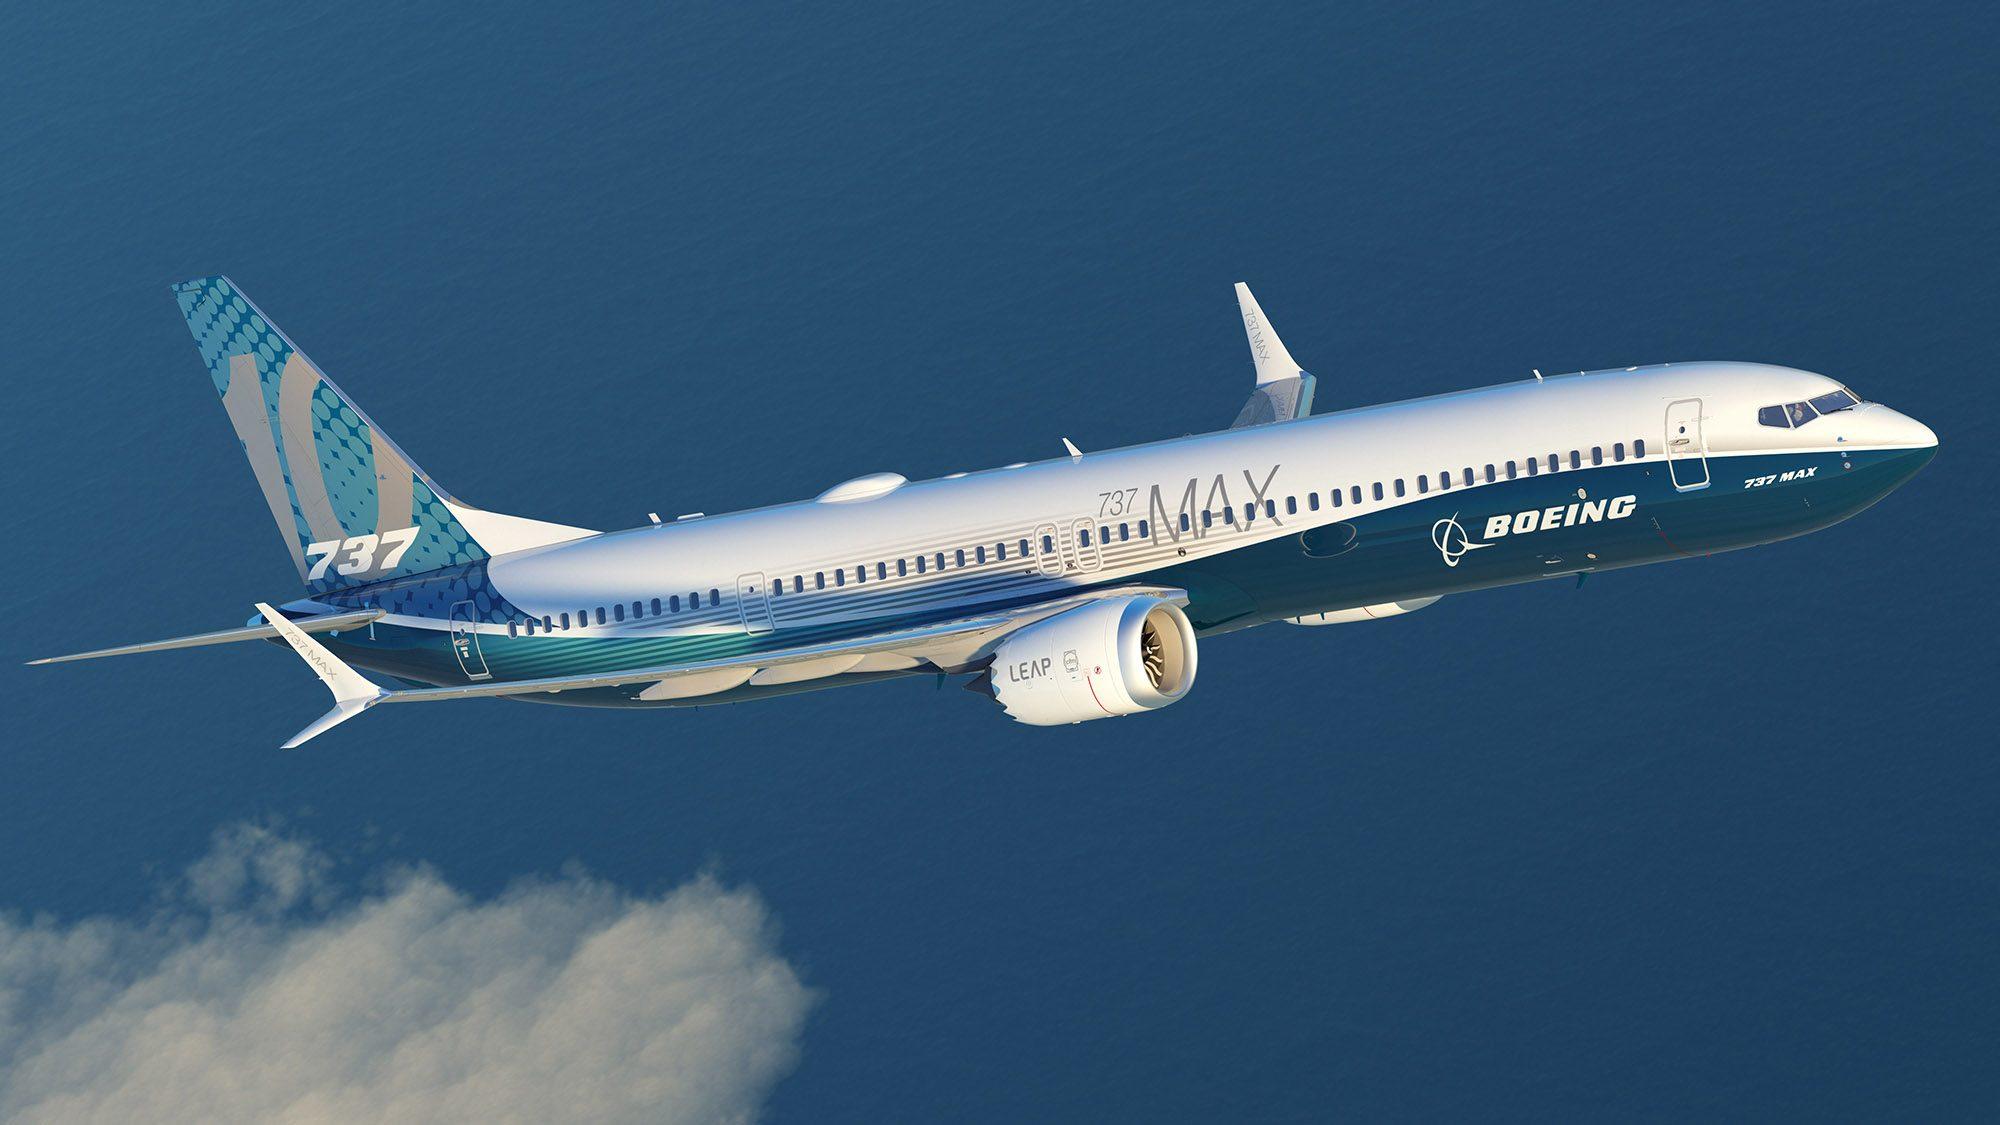 [Imagen: Boeing-737-MAX-10-2000x1125.jpg]